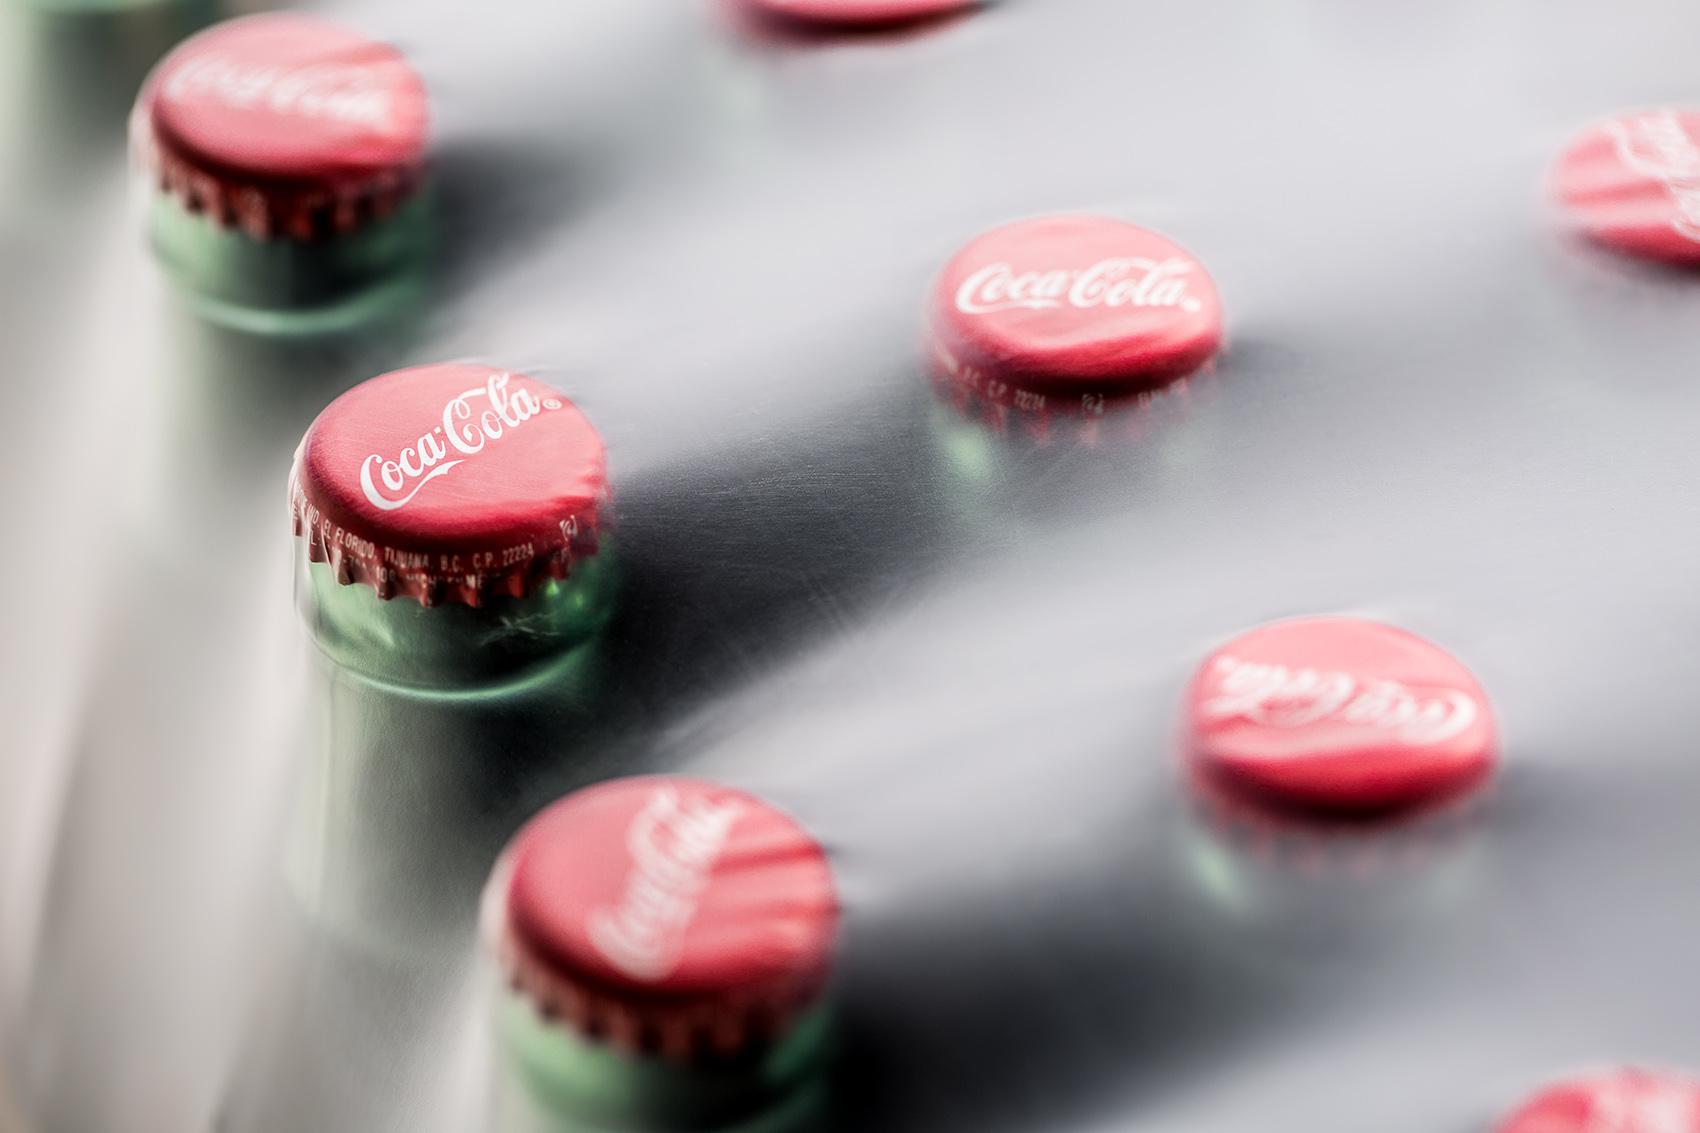 Coca Cola soda bottles close up under plastic wrap packaging